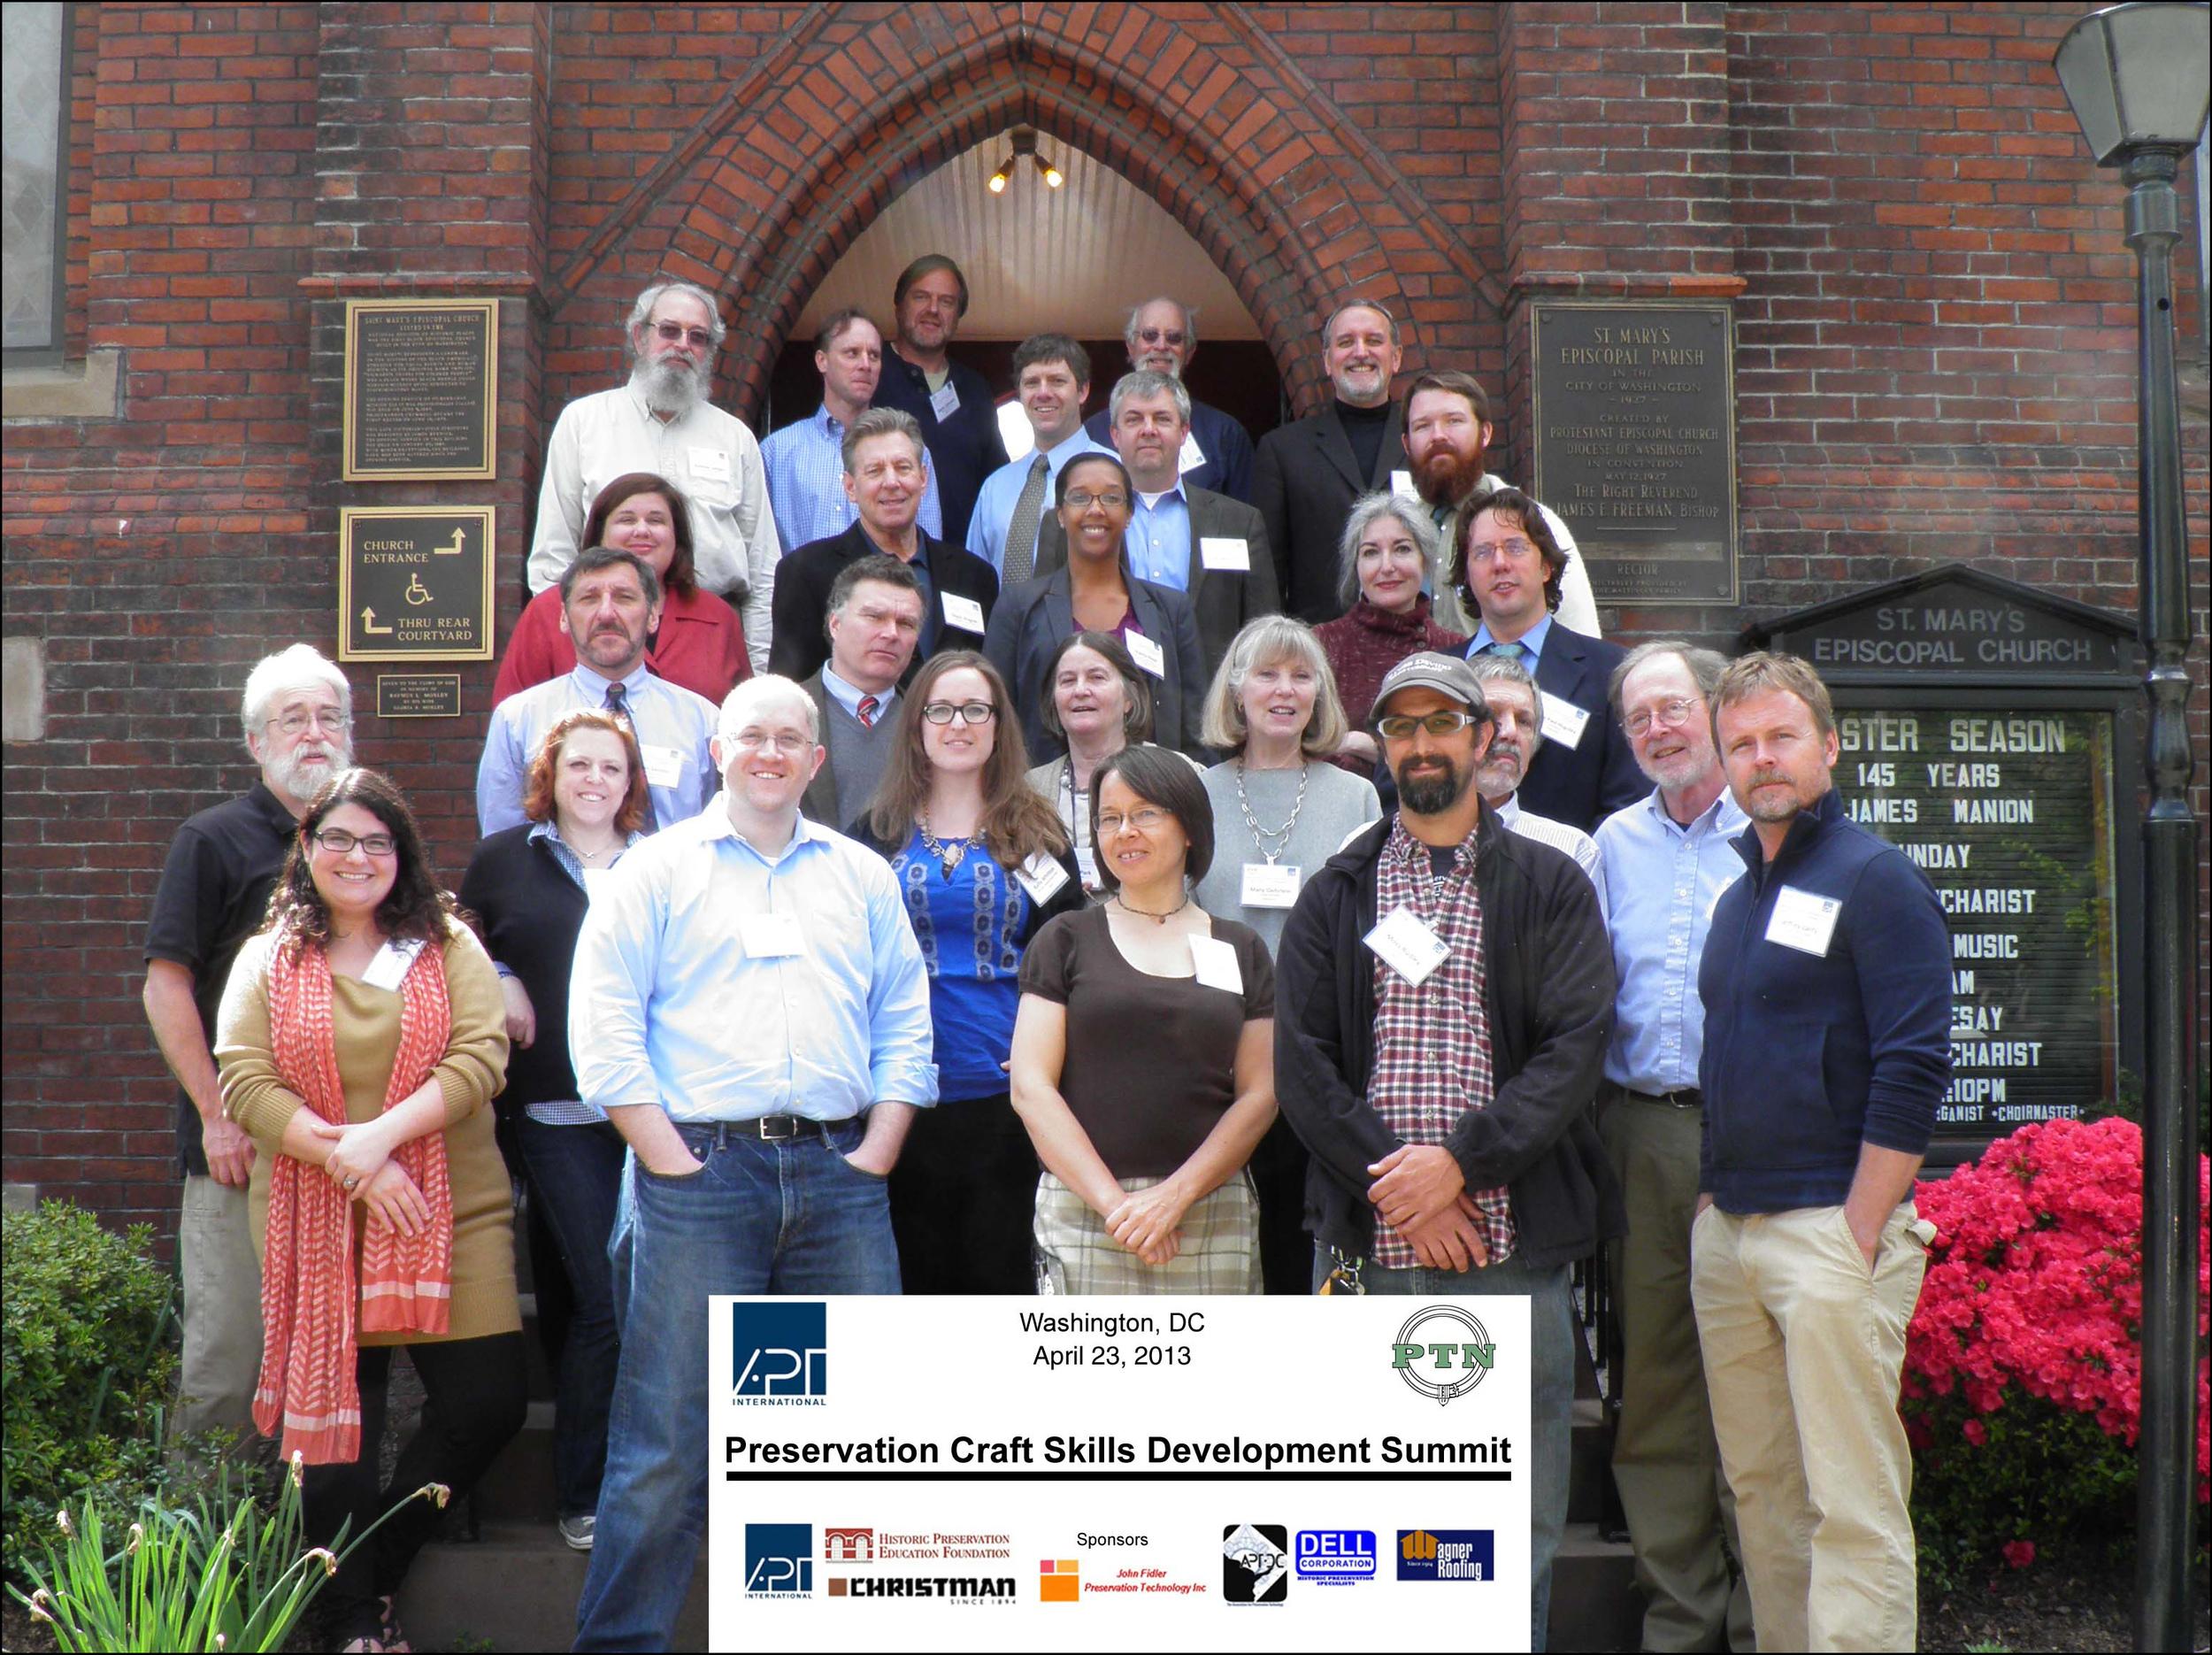 Delegates at the Preservation Craft Skills Summit (Photo credit: © J. Bryan Blundell)